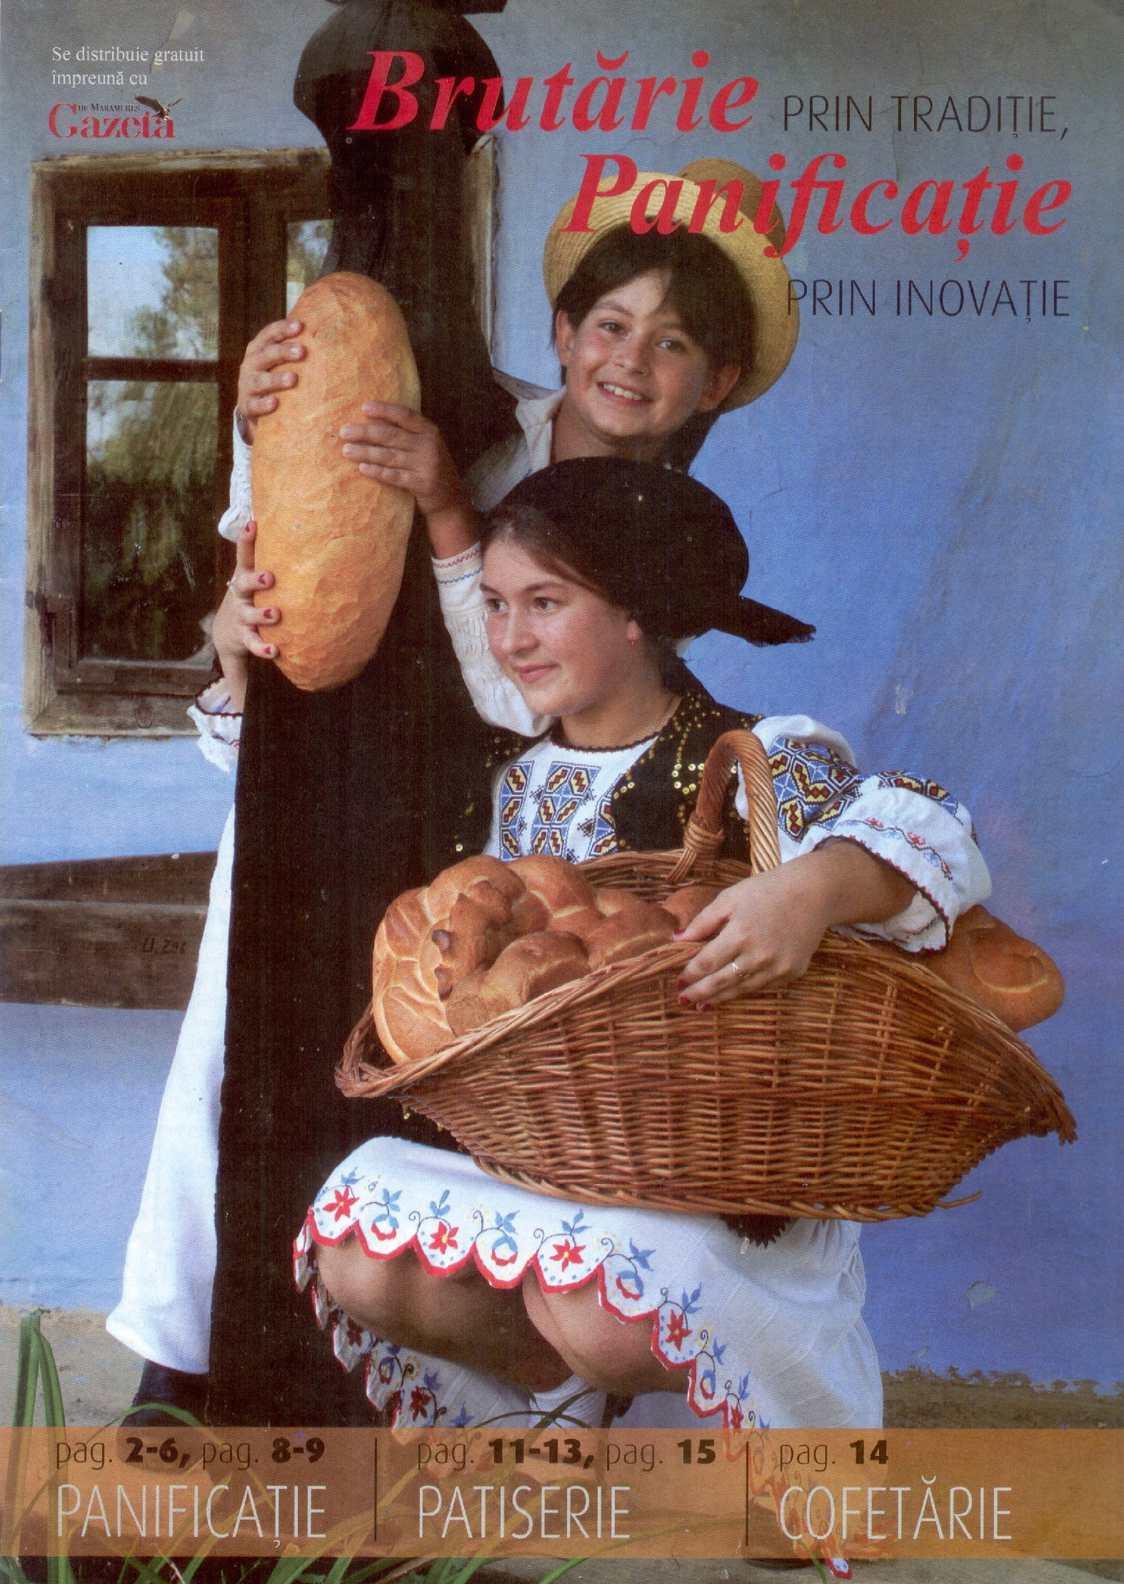 Andana Pan - brutarie, panificatie, patiserie, cofetarie